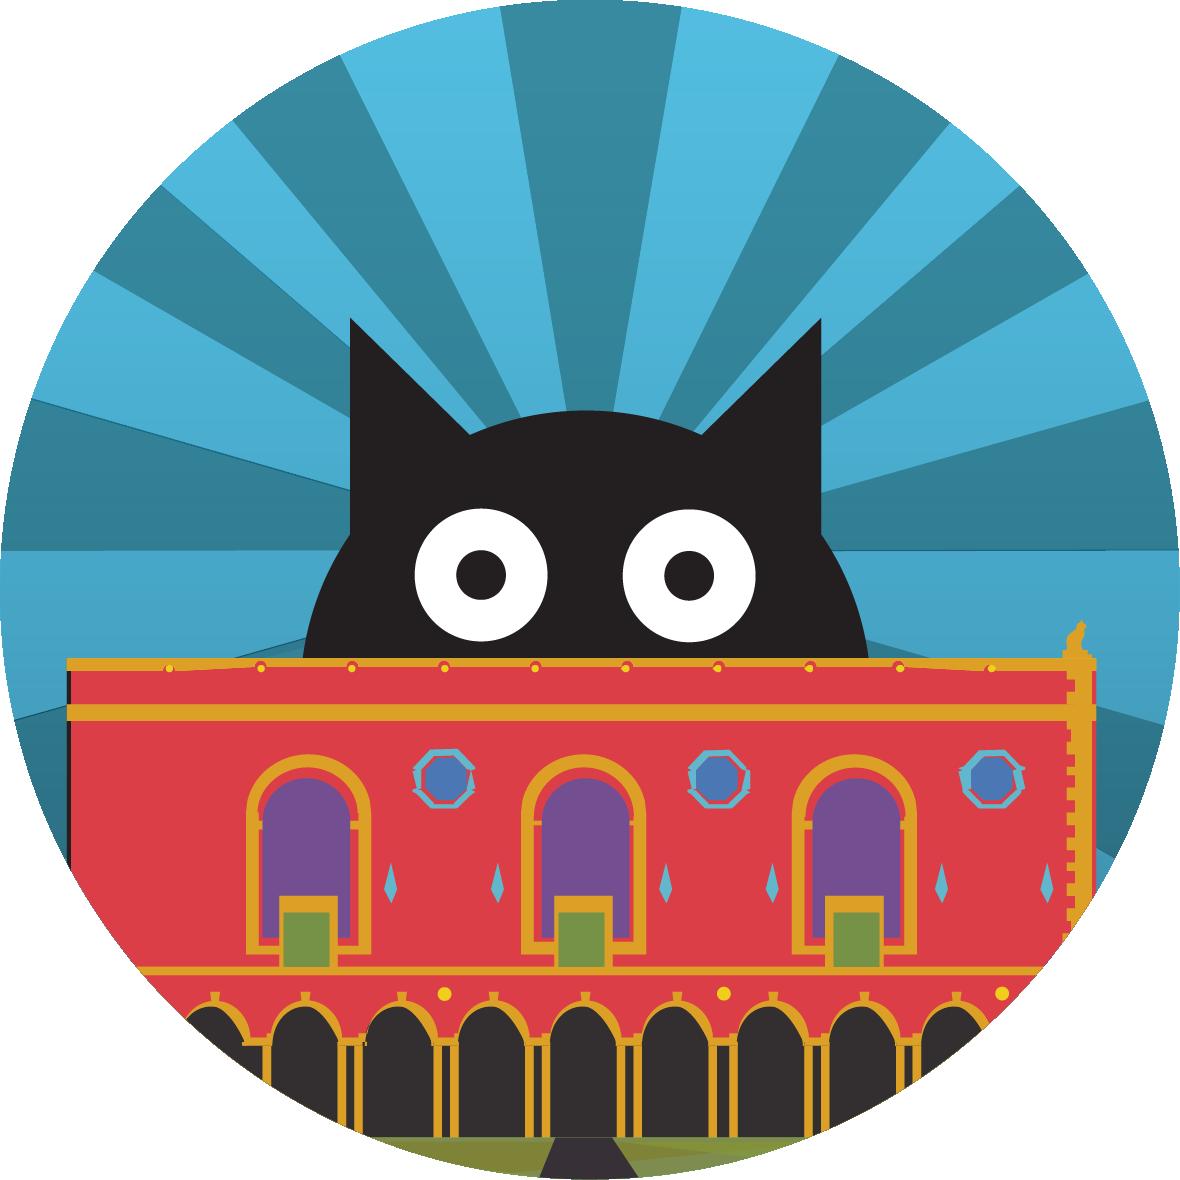 Catsbury_circular logos-11_WEB.png